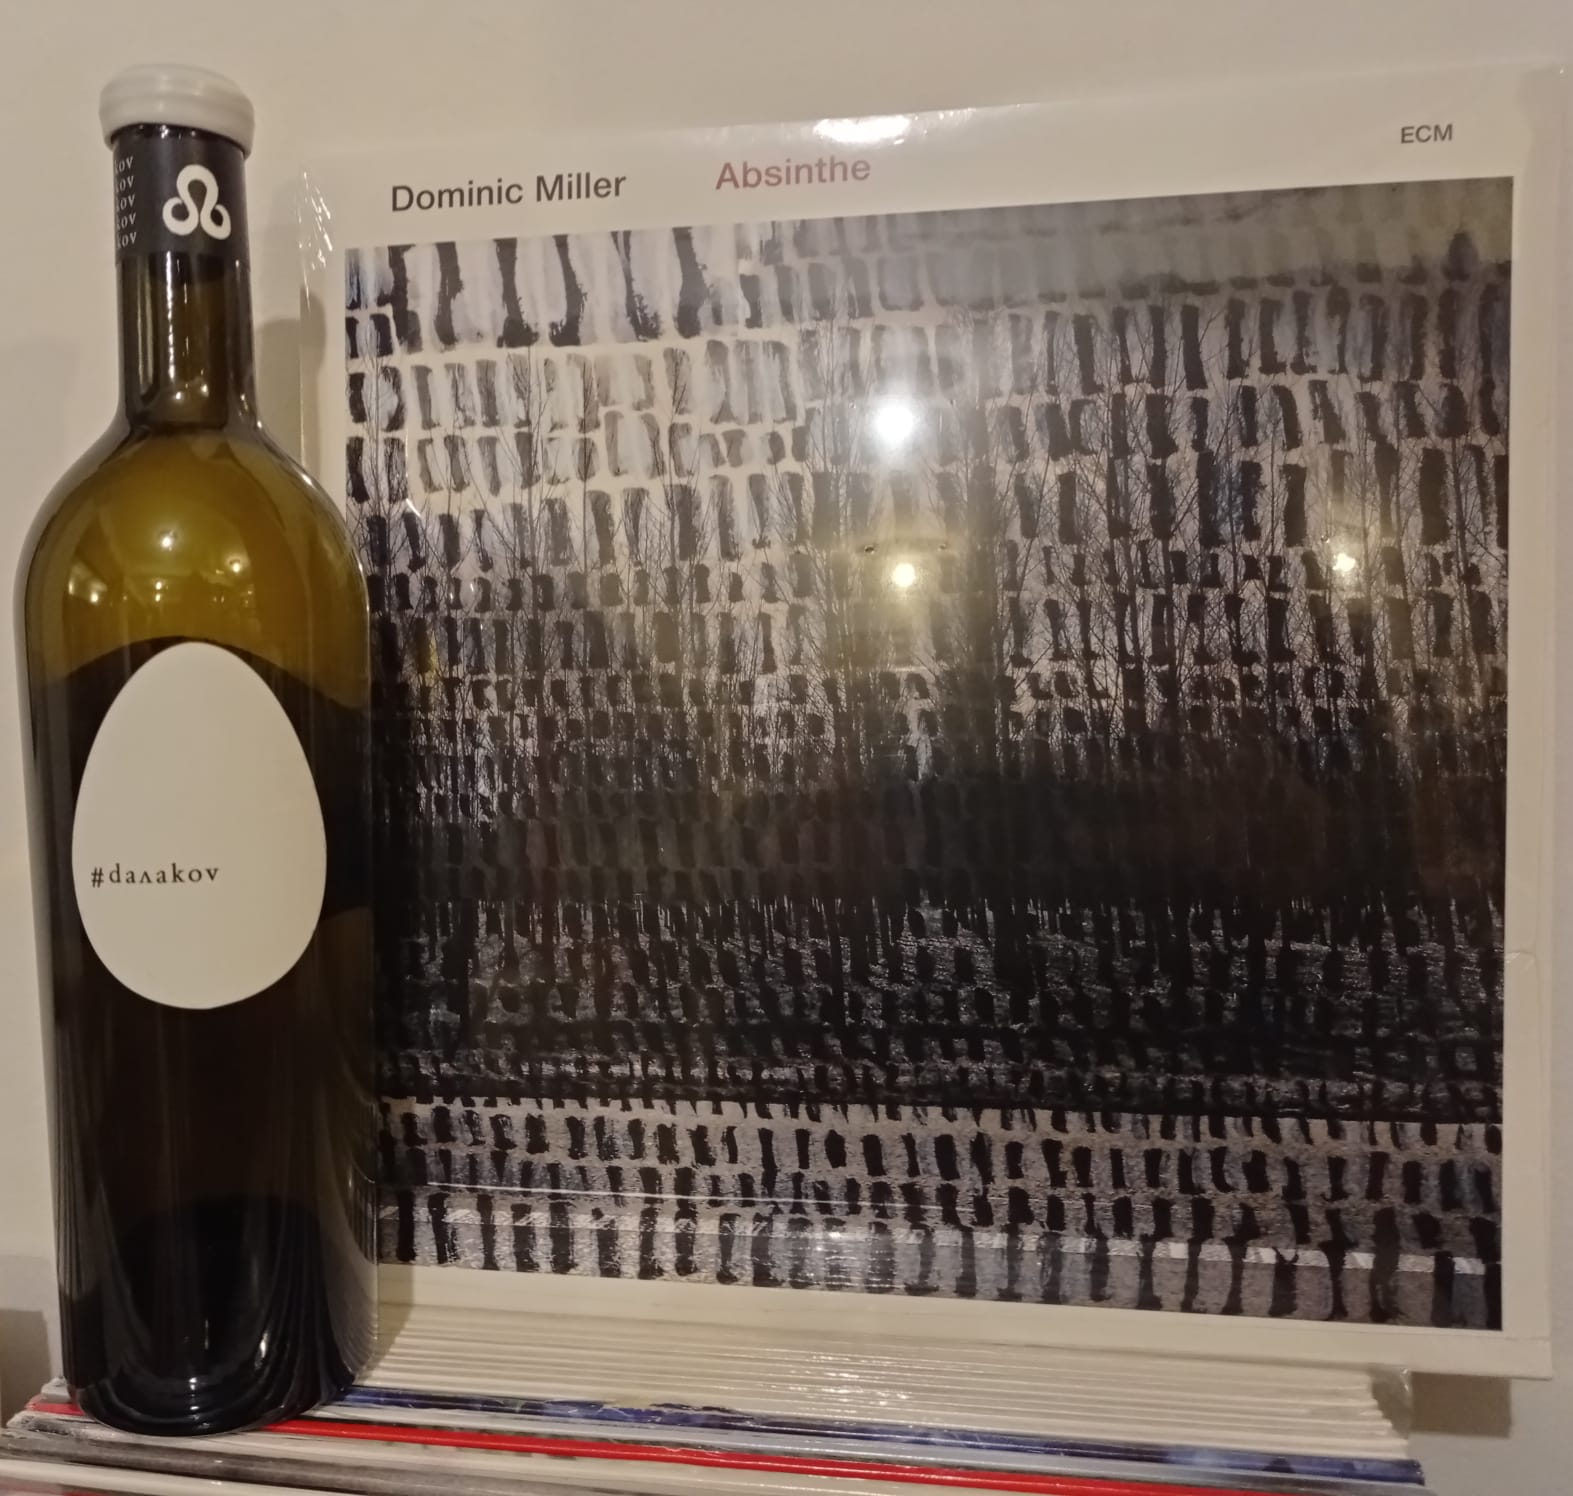 "Dominic Miller ""Absinthe"" +  Мискет бленд The EGG, 2018 – Betterhalf Garage Wines"